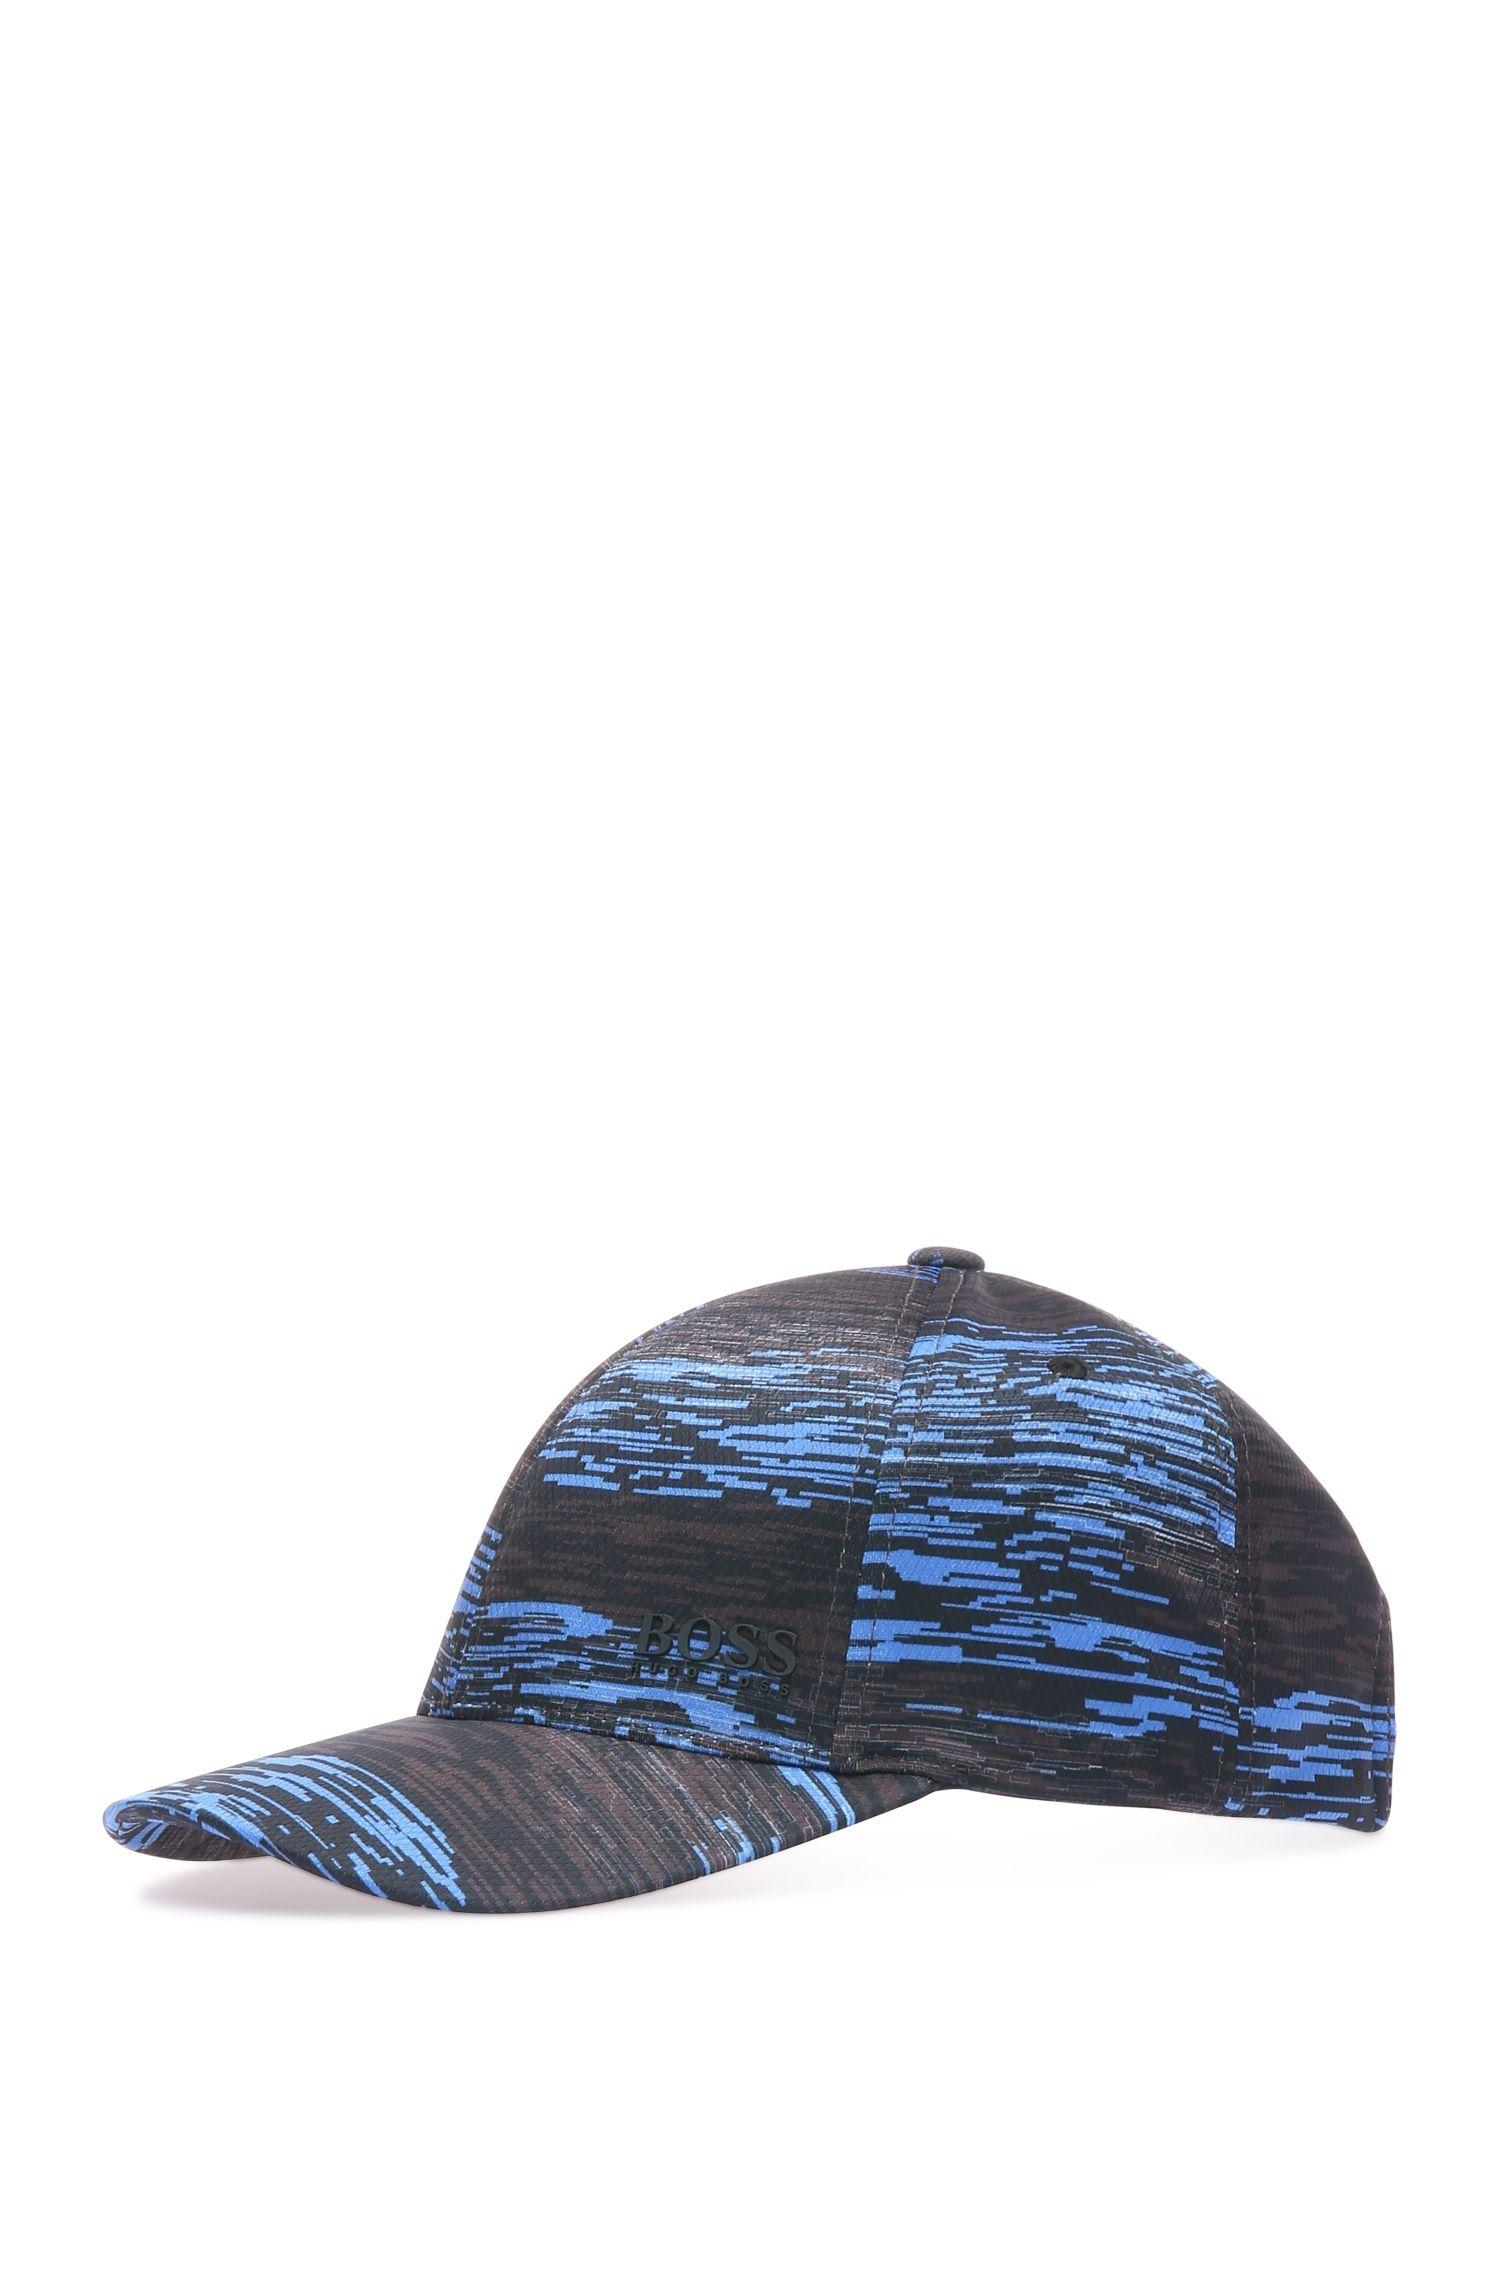 Basecap aus Material-Mix mit Muster: ´Printcap`